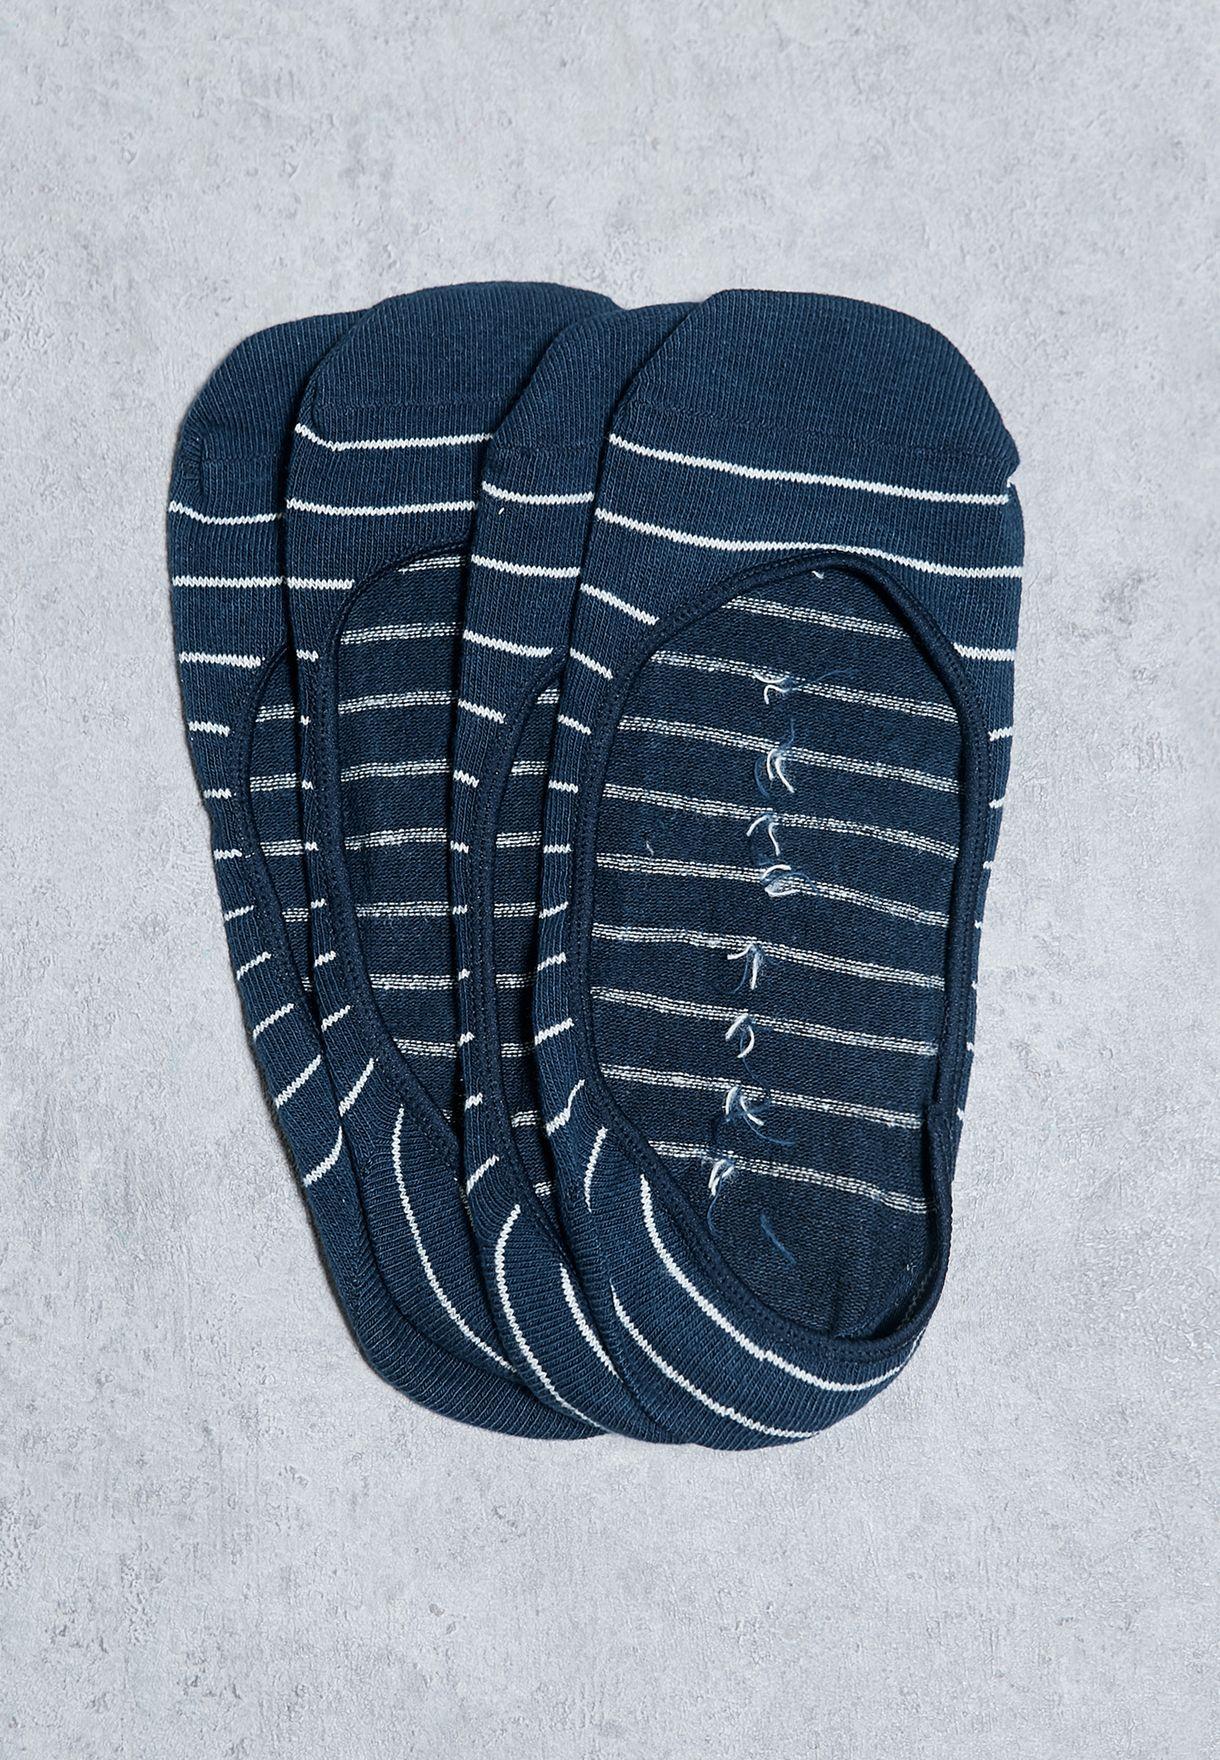 f47667309 تسوق جوارب بدرزات ماركة مانجو مان لون كحلي 83003050 في عمان ...